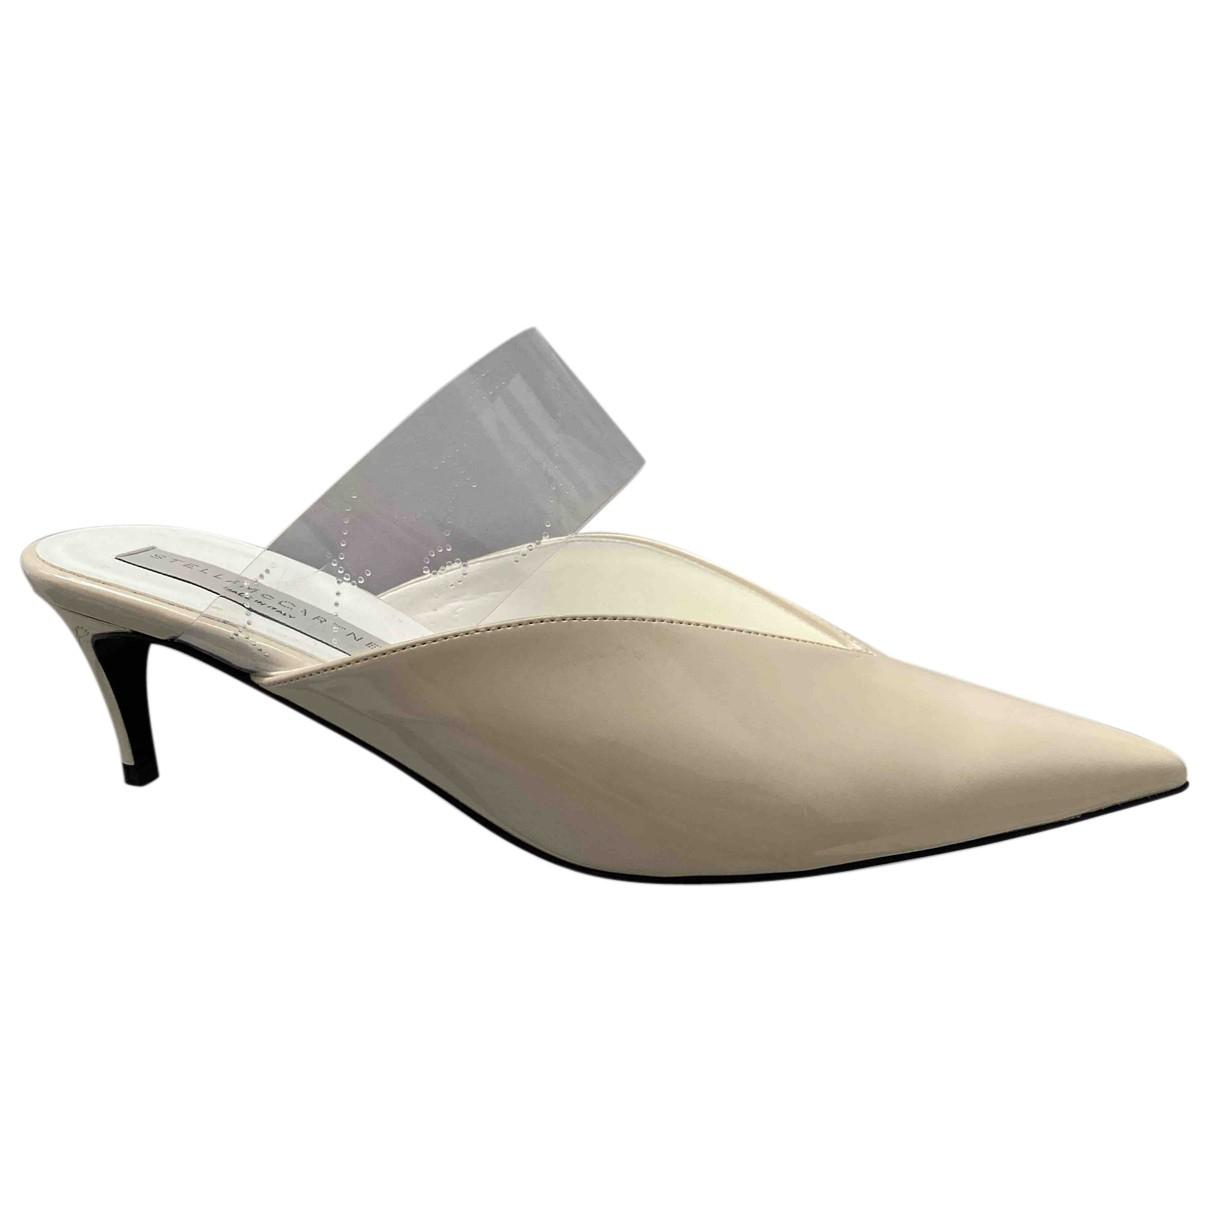 Stella Mccartney - Sandales   pour femme en toile - beige